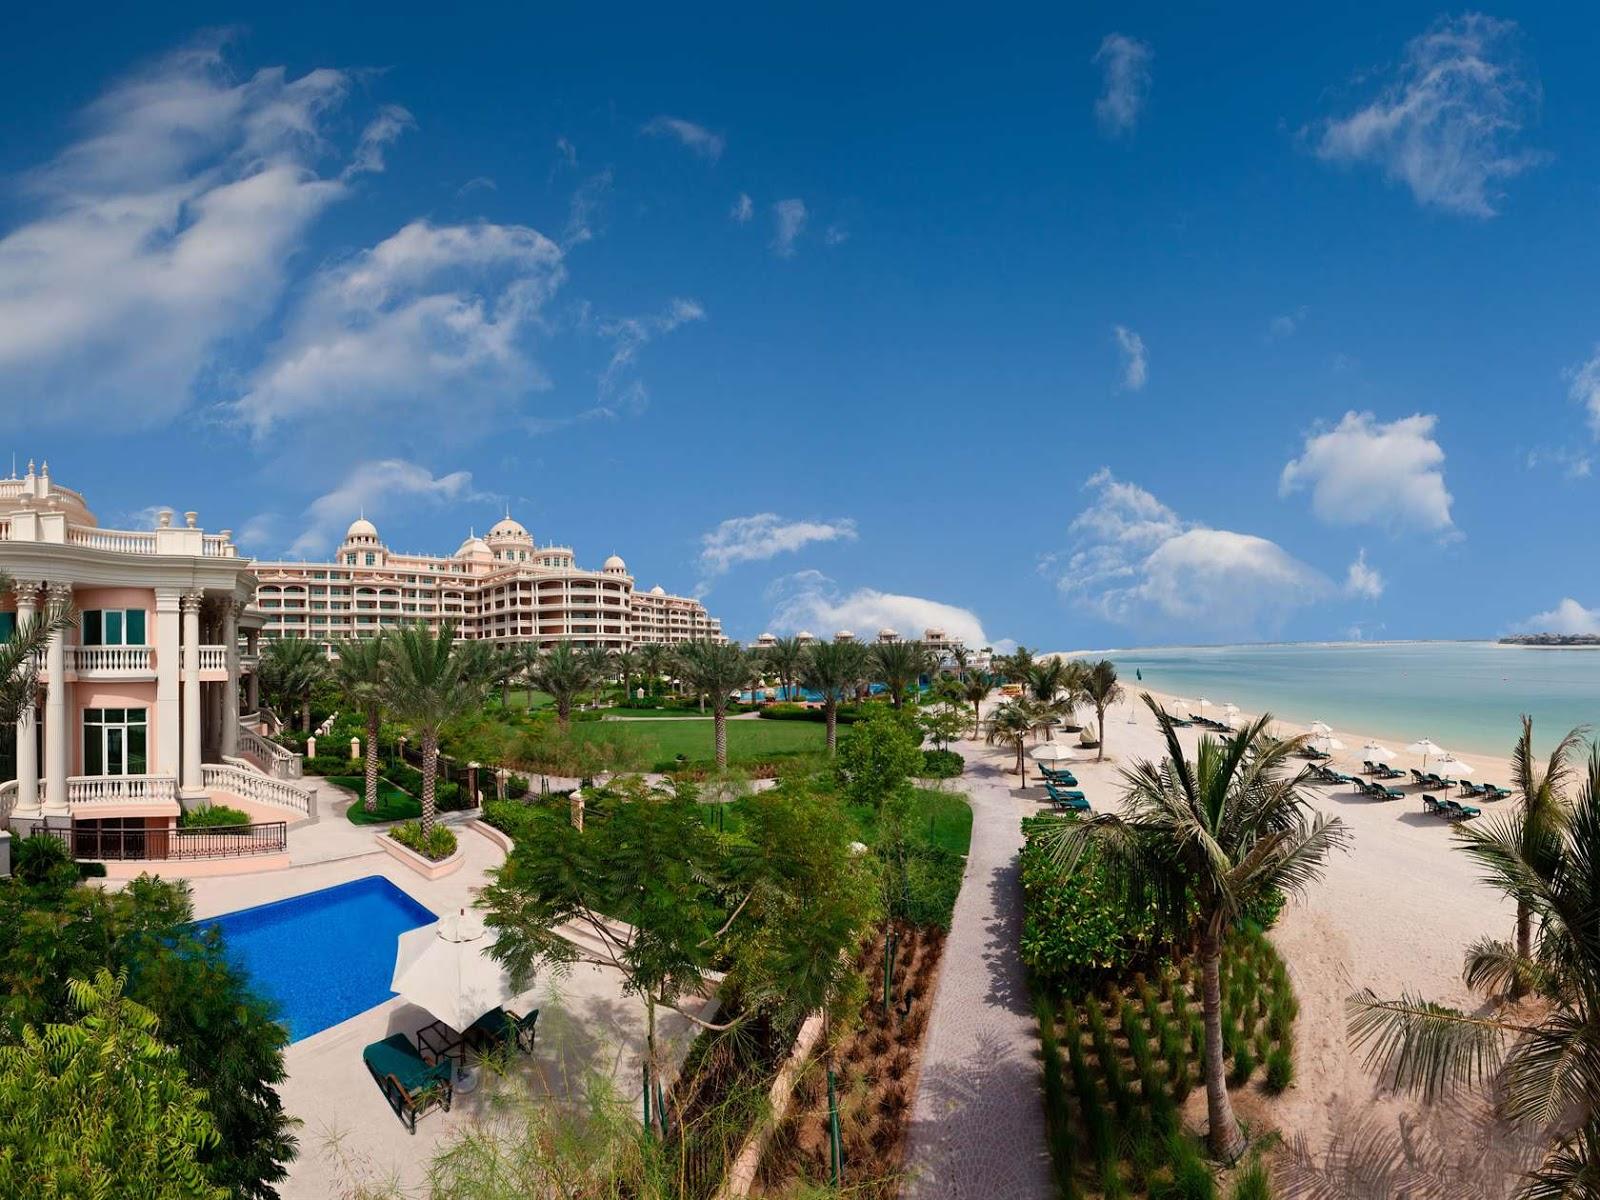 Travel Trip Journey: Palm Jumeirah Dubai